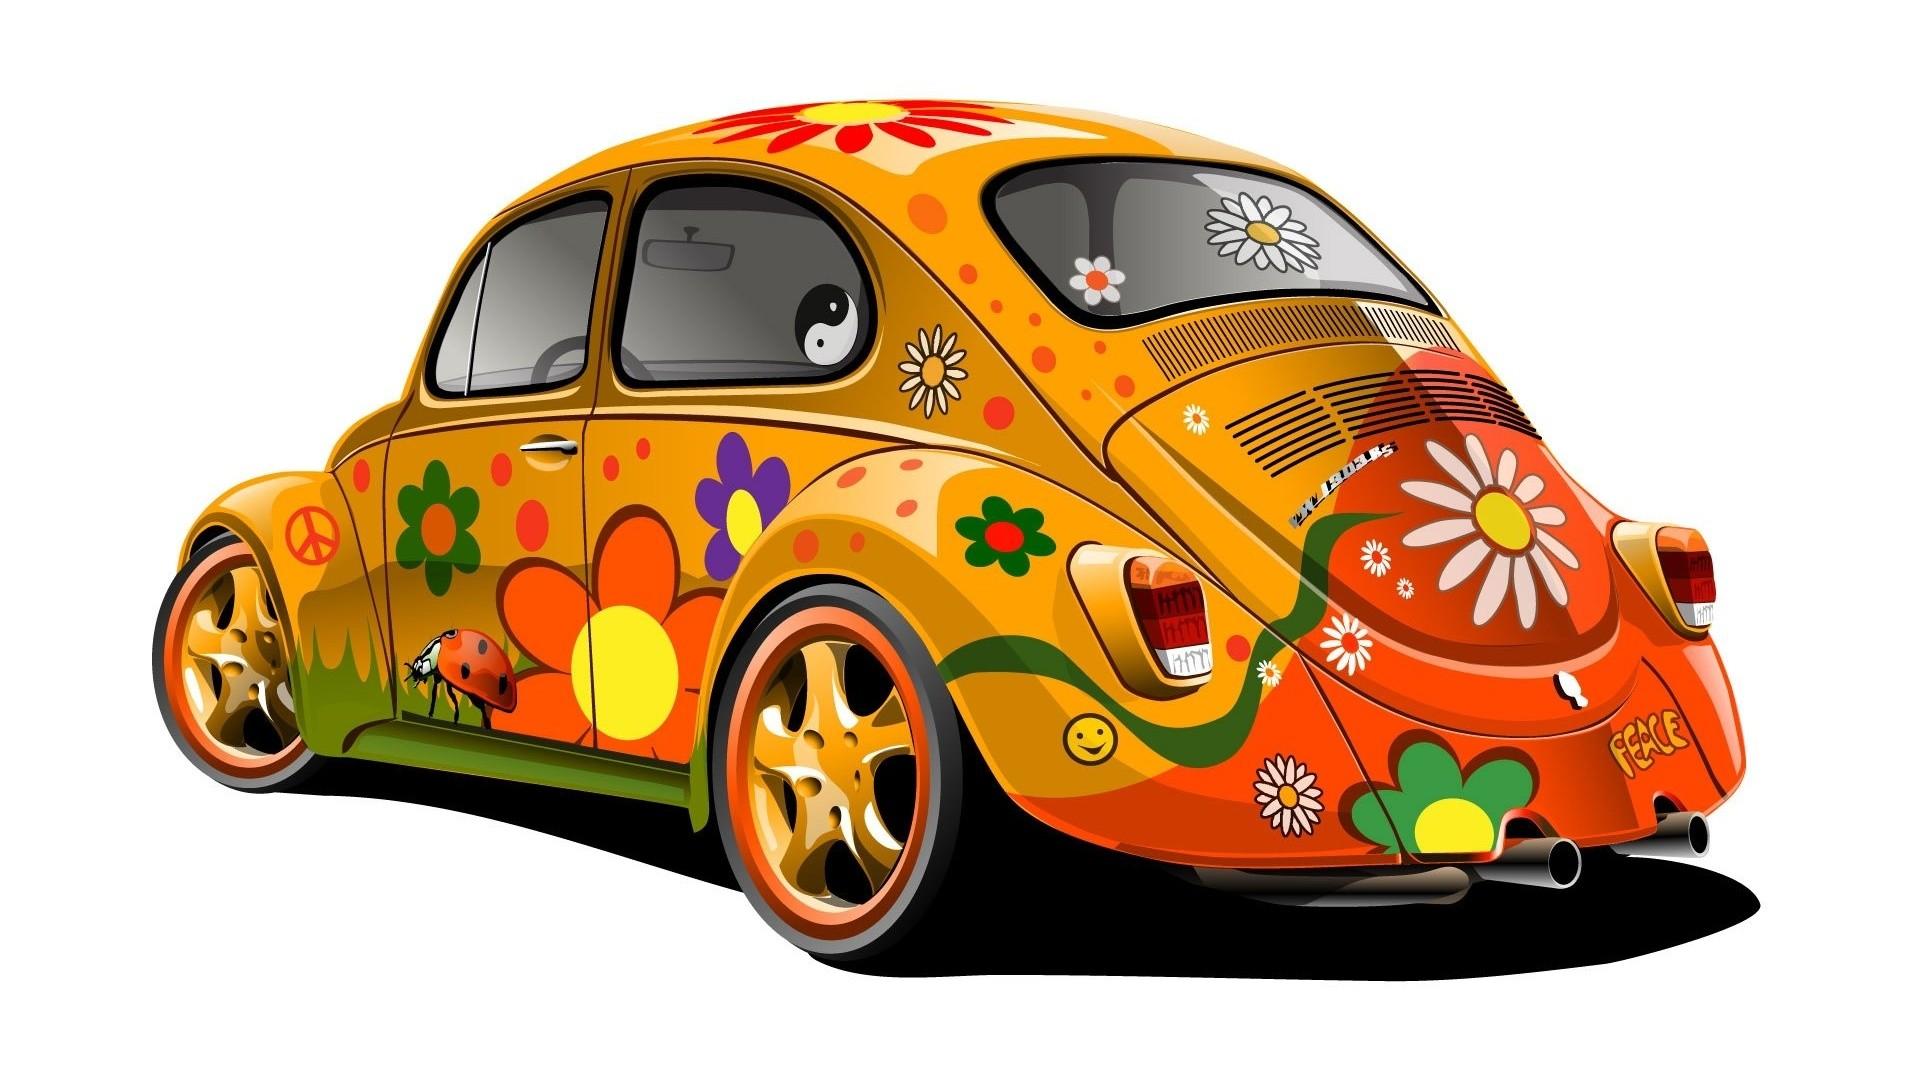 12 HD Hippie Desktop Wallpapers For Free Download